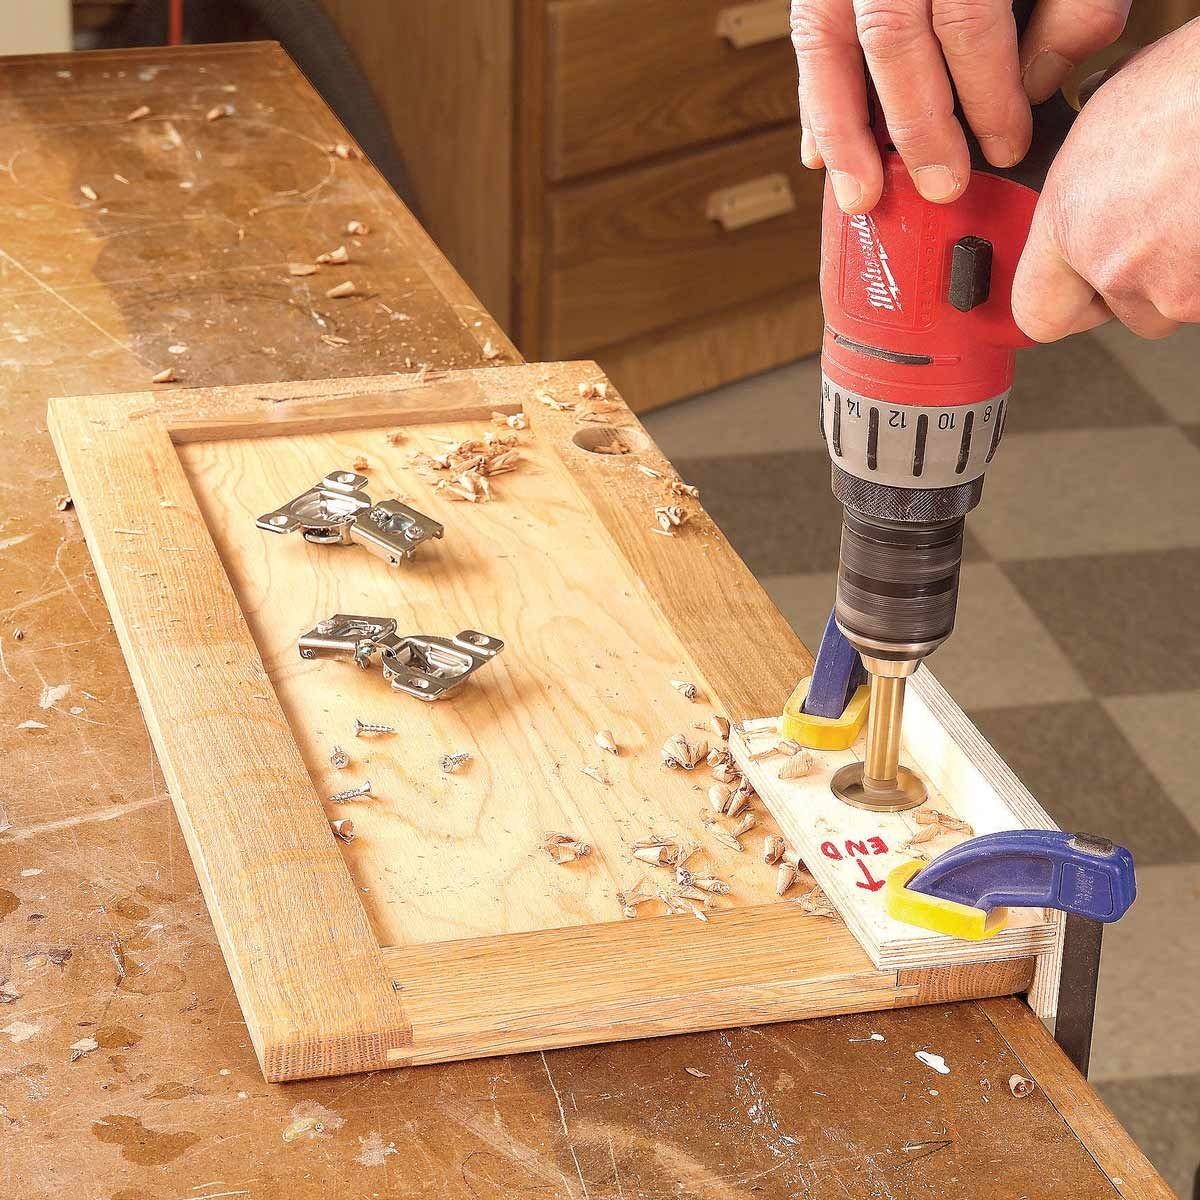 euro-hinge drilling jig | diy | woodworking, antique